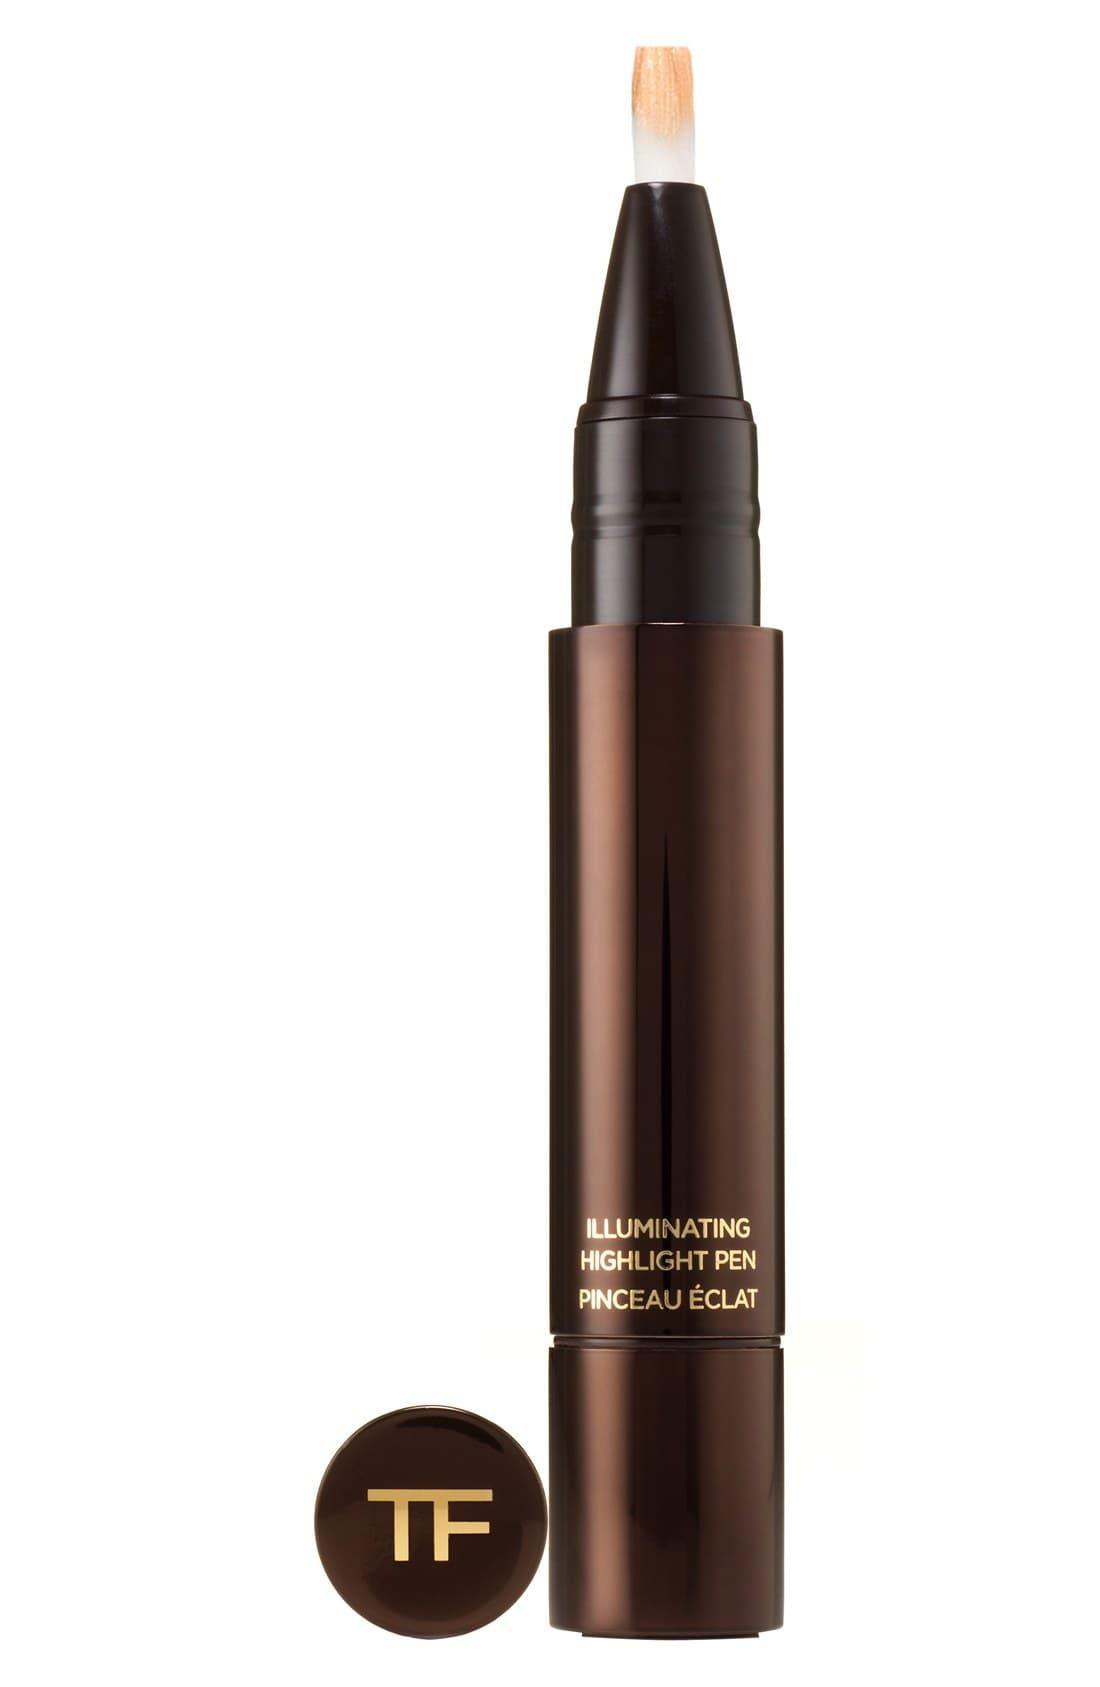 Tom Ford Illuminating Highlight Pen Dusk Bisque Best Highlighter Everyday Makeup Tutorials Translucent Powder